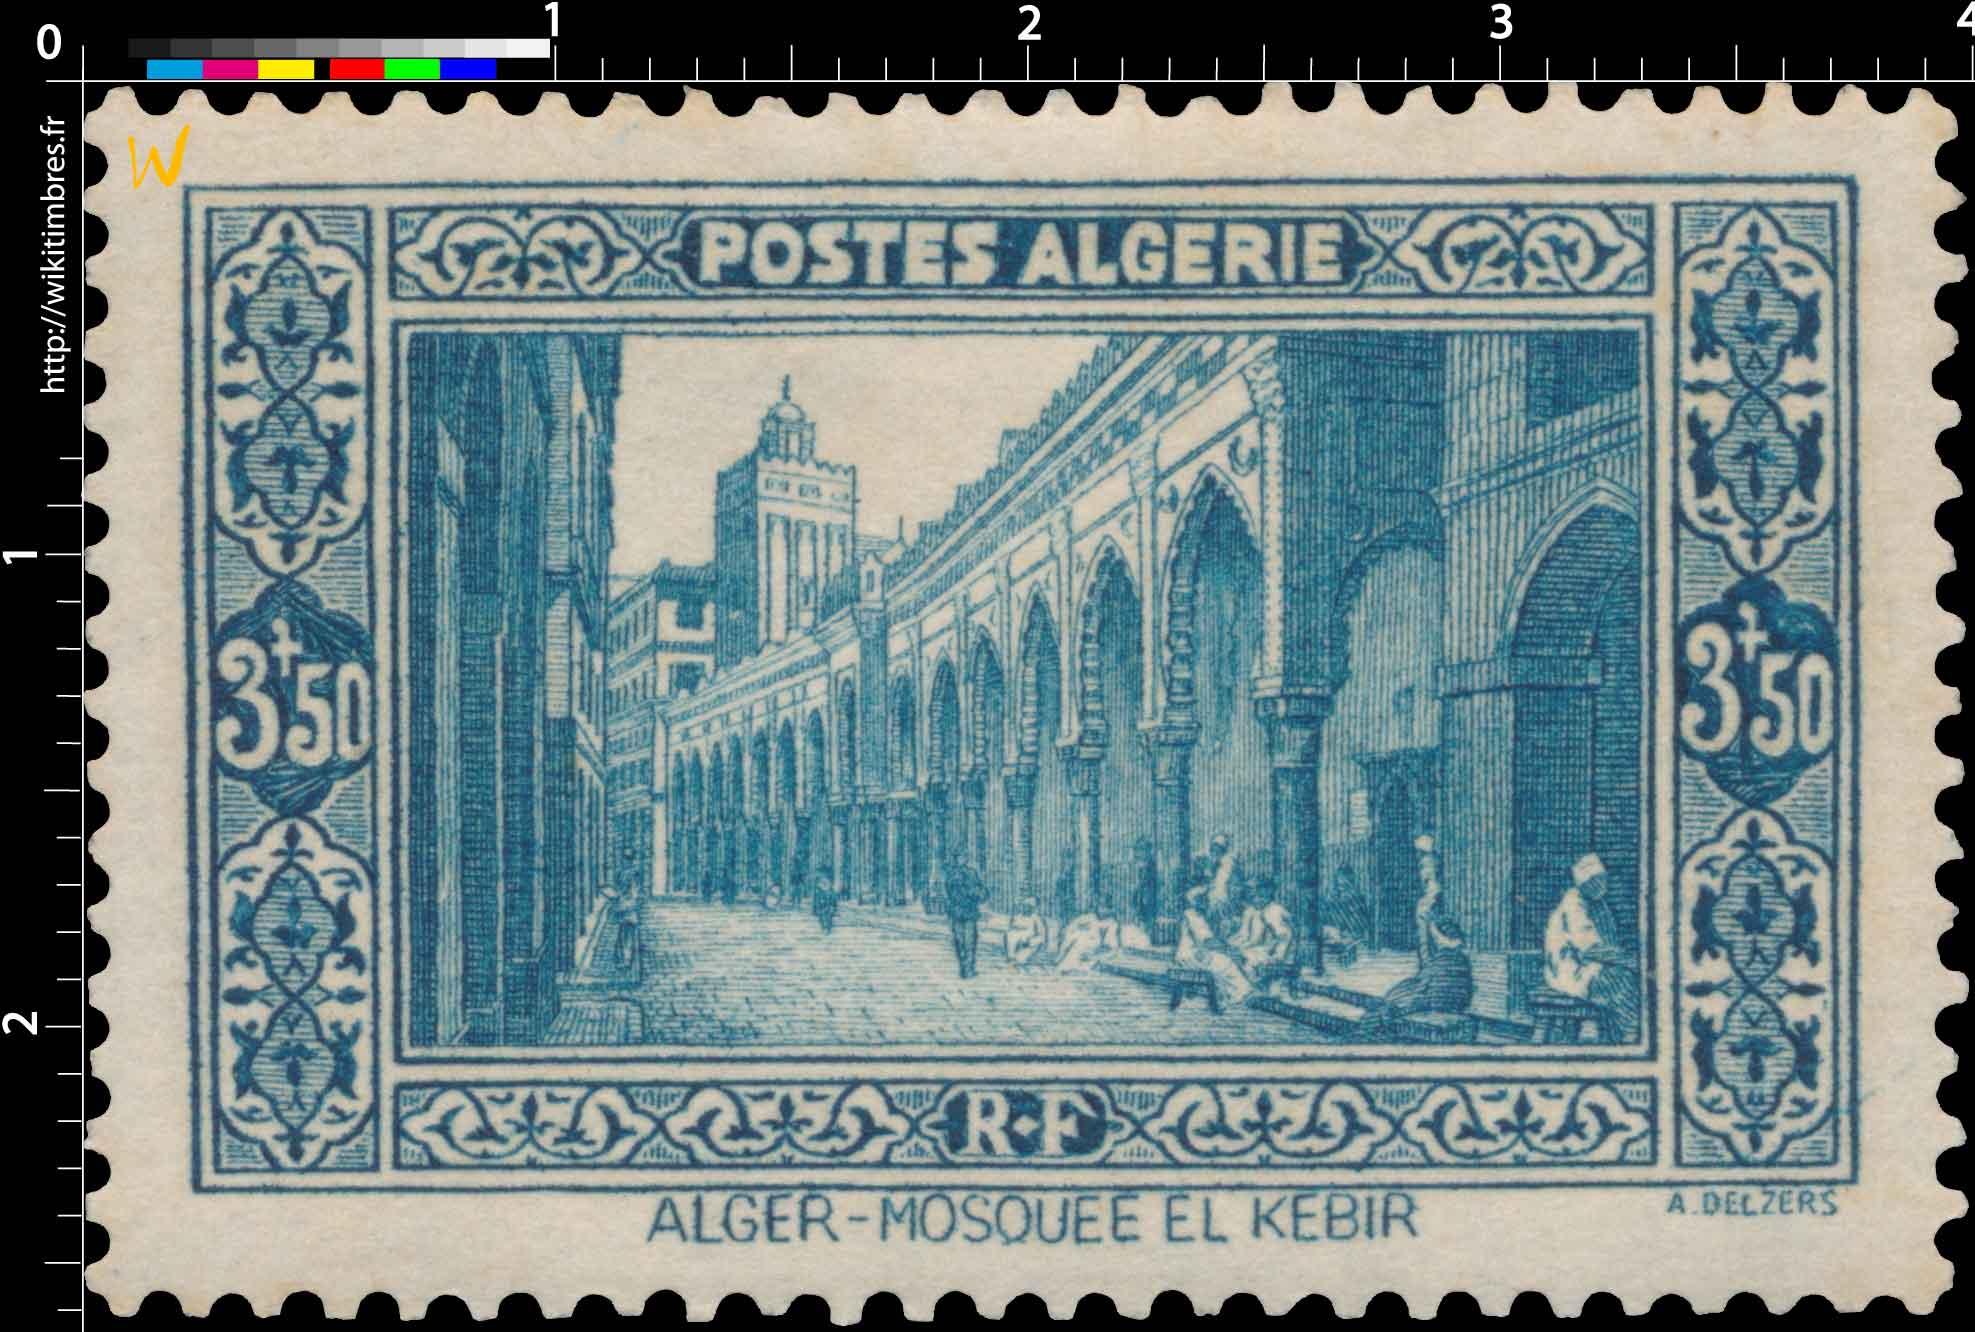 Algérie - Alger Mosquée El Kébir